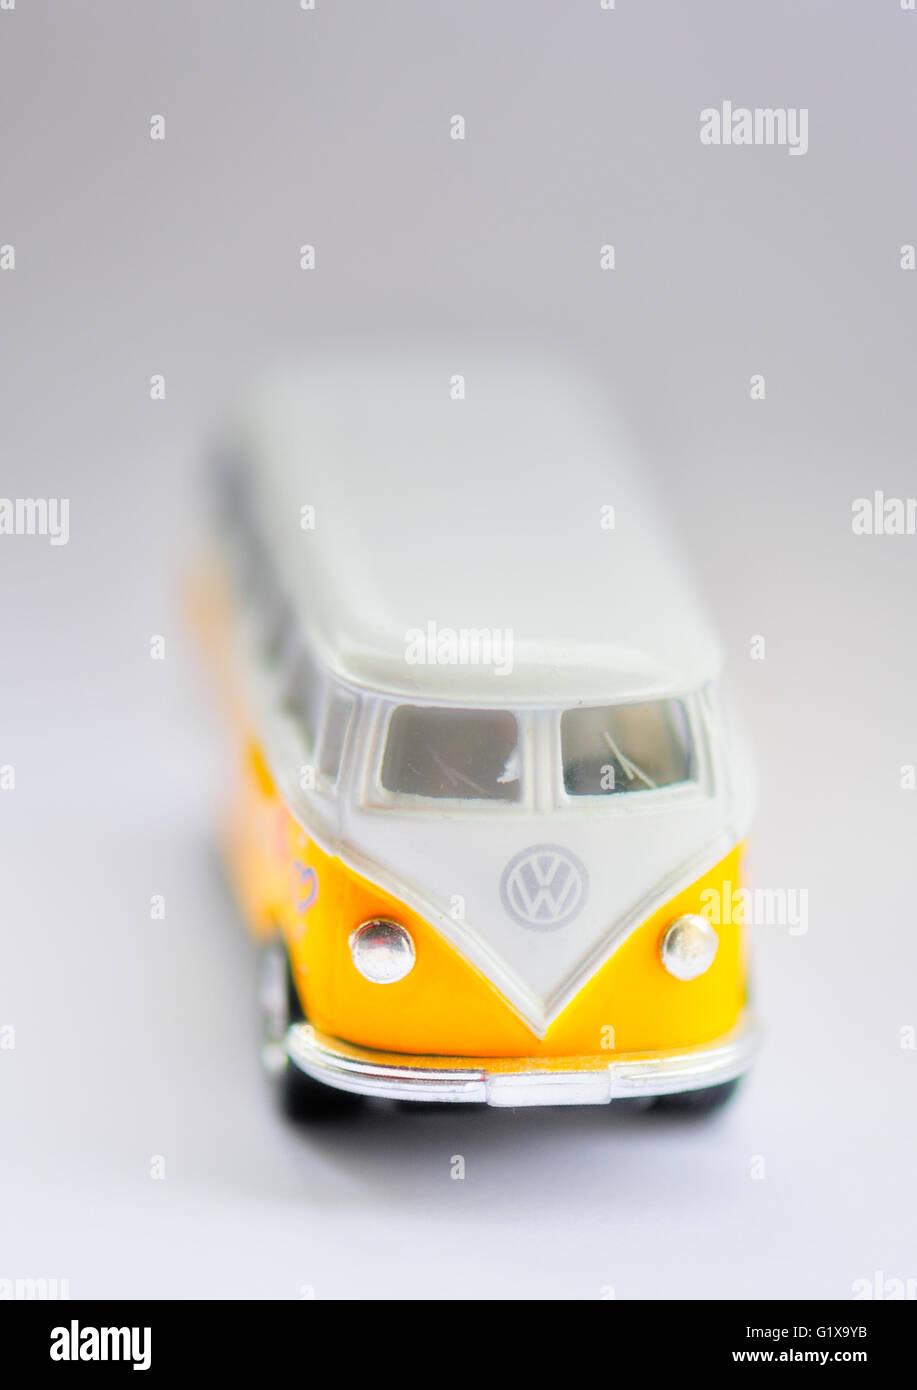 W Toy Stock Photos Amp W Toy Stock Images Alamy